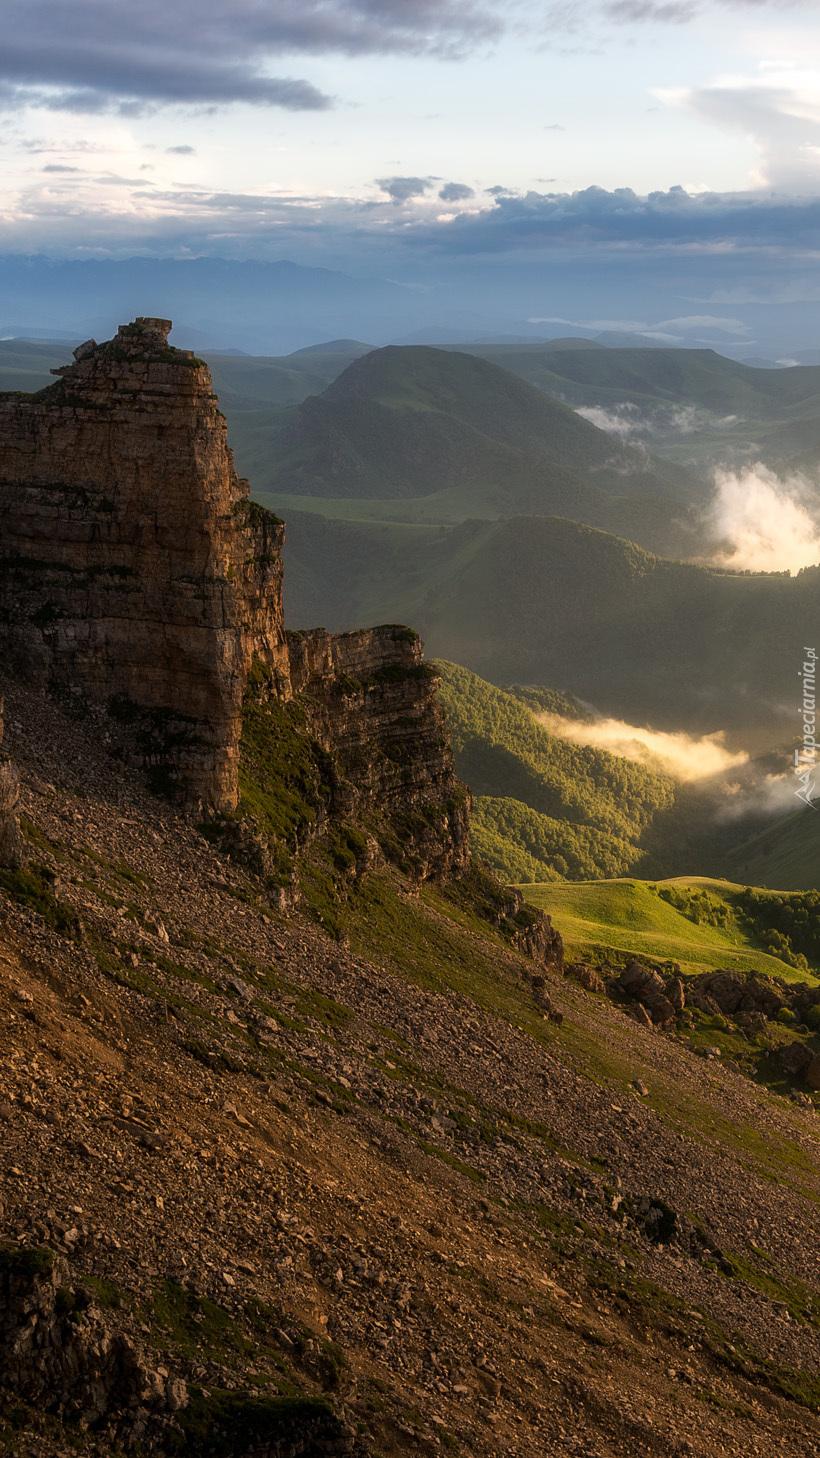 Widok ze skały na góry we mgle